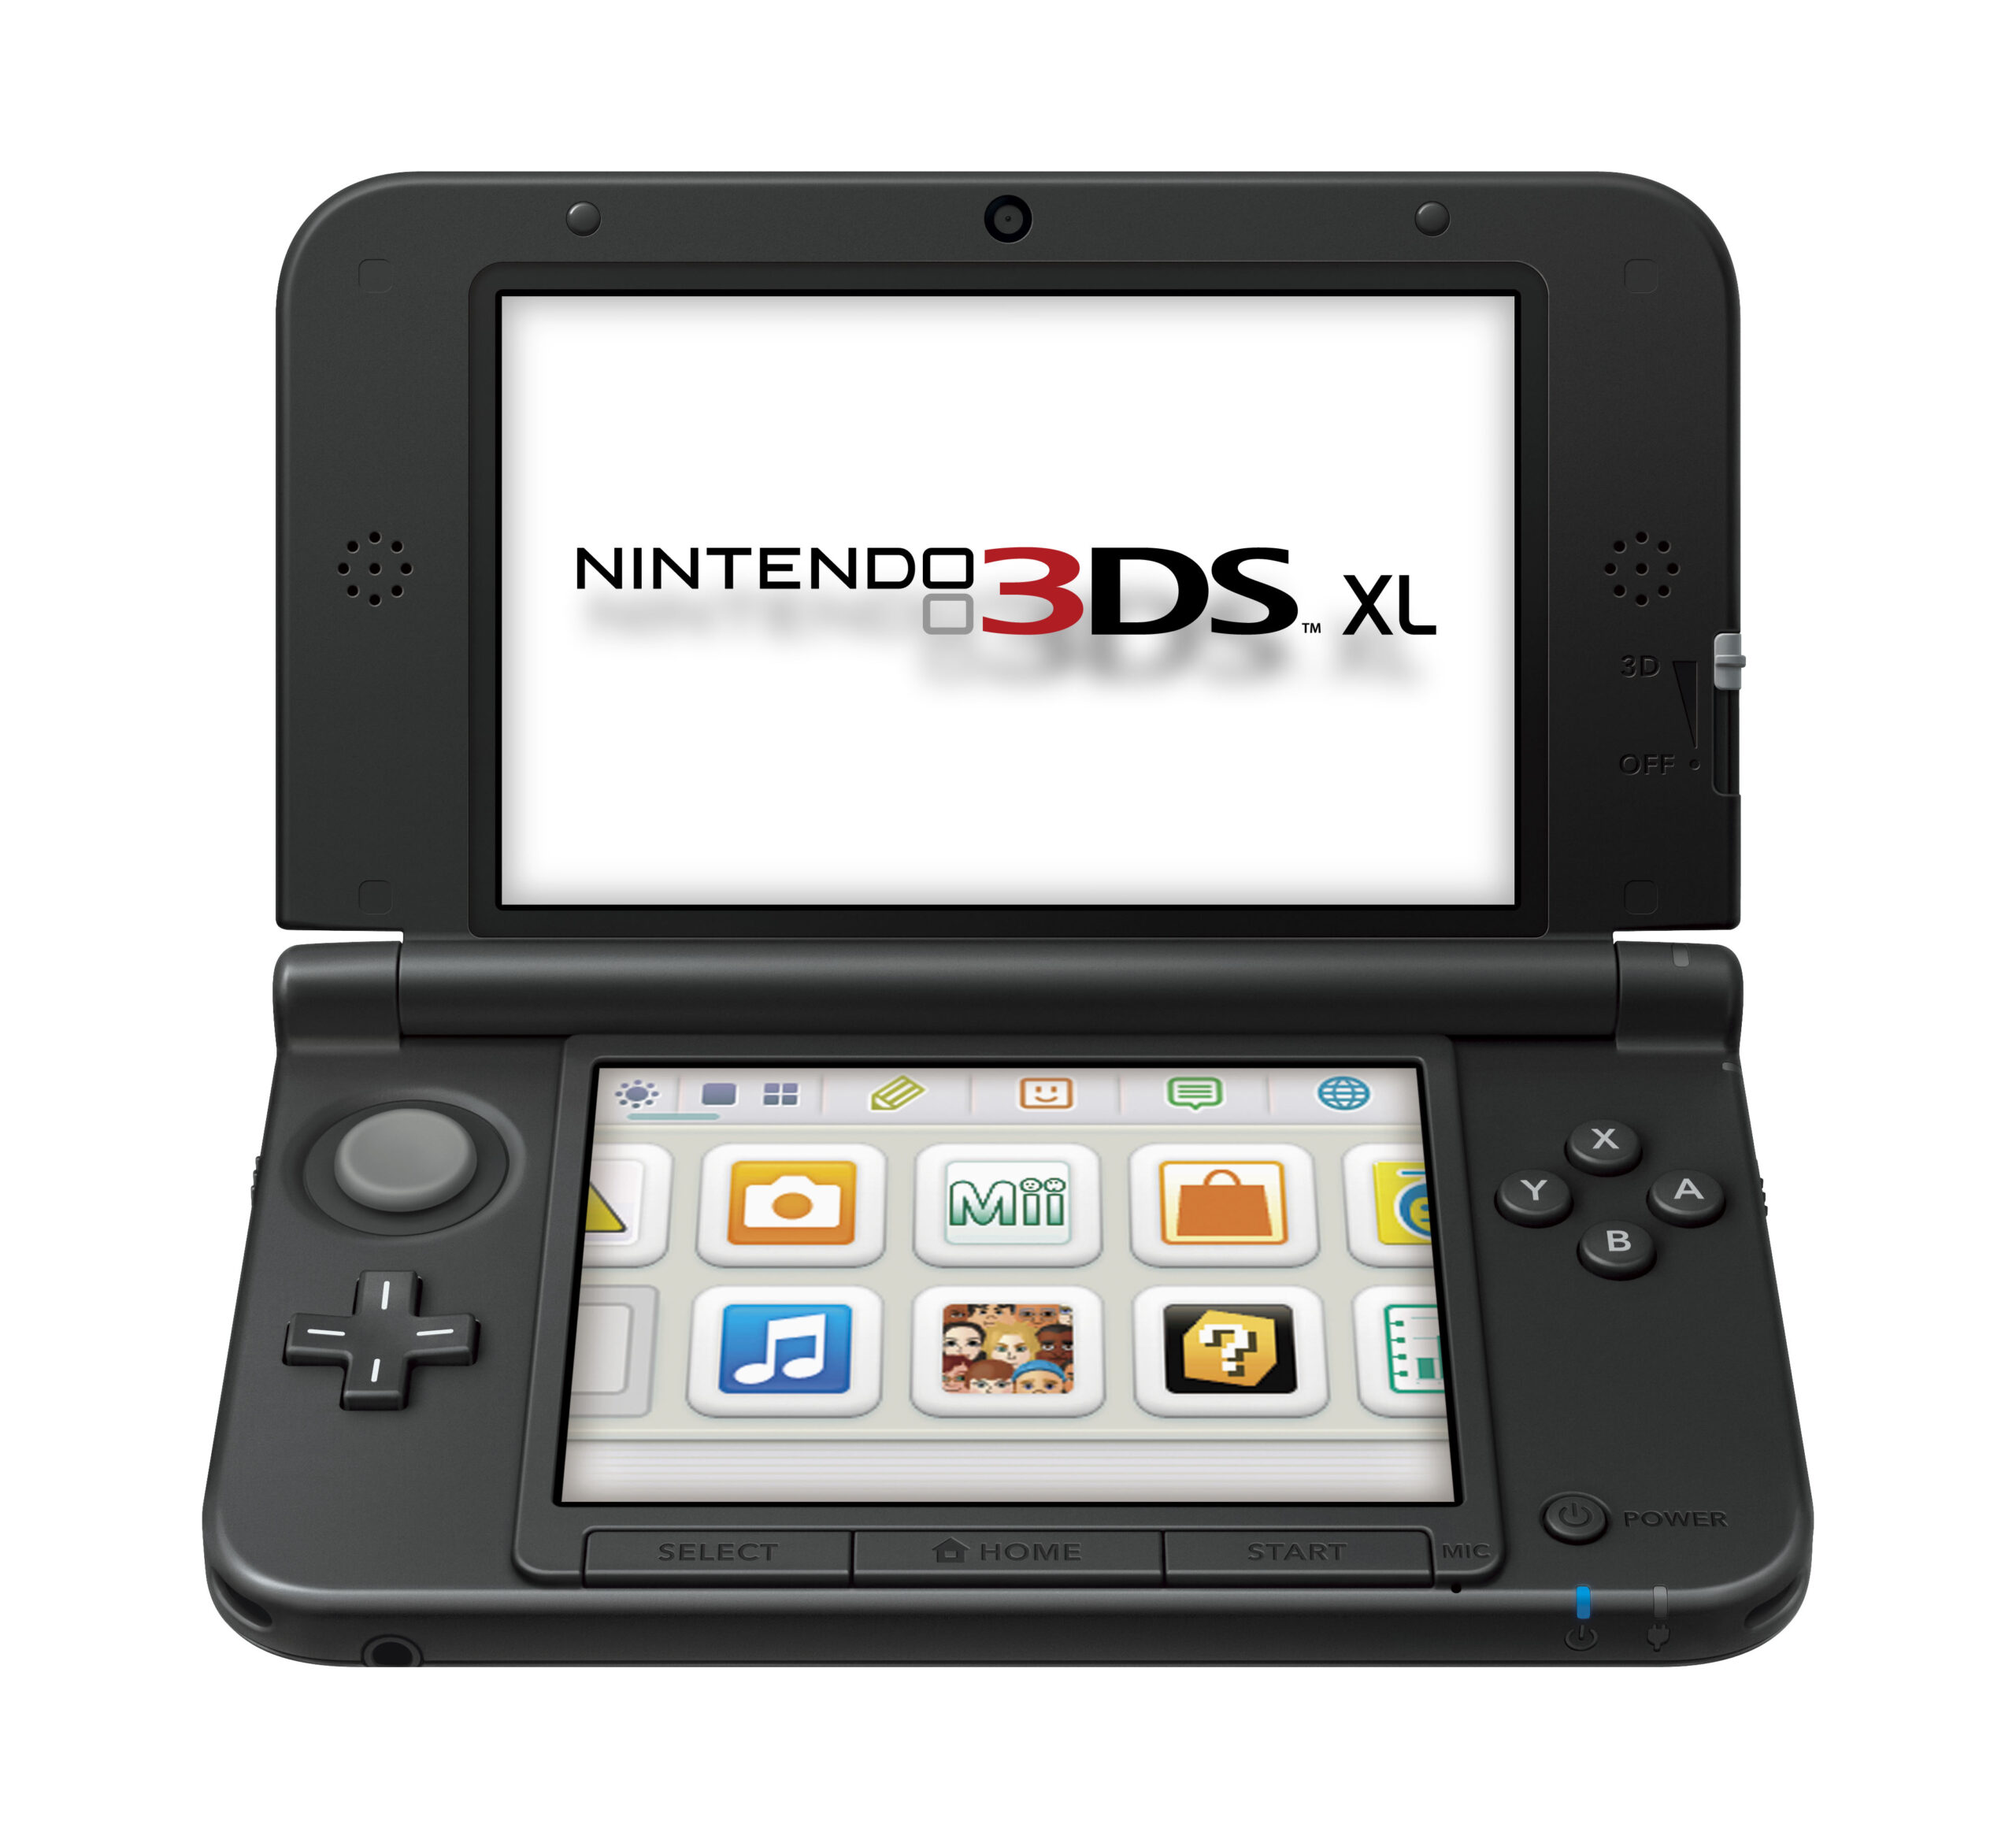 3DS-XL_2012_06-22-12_002